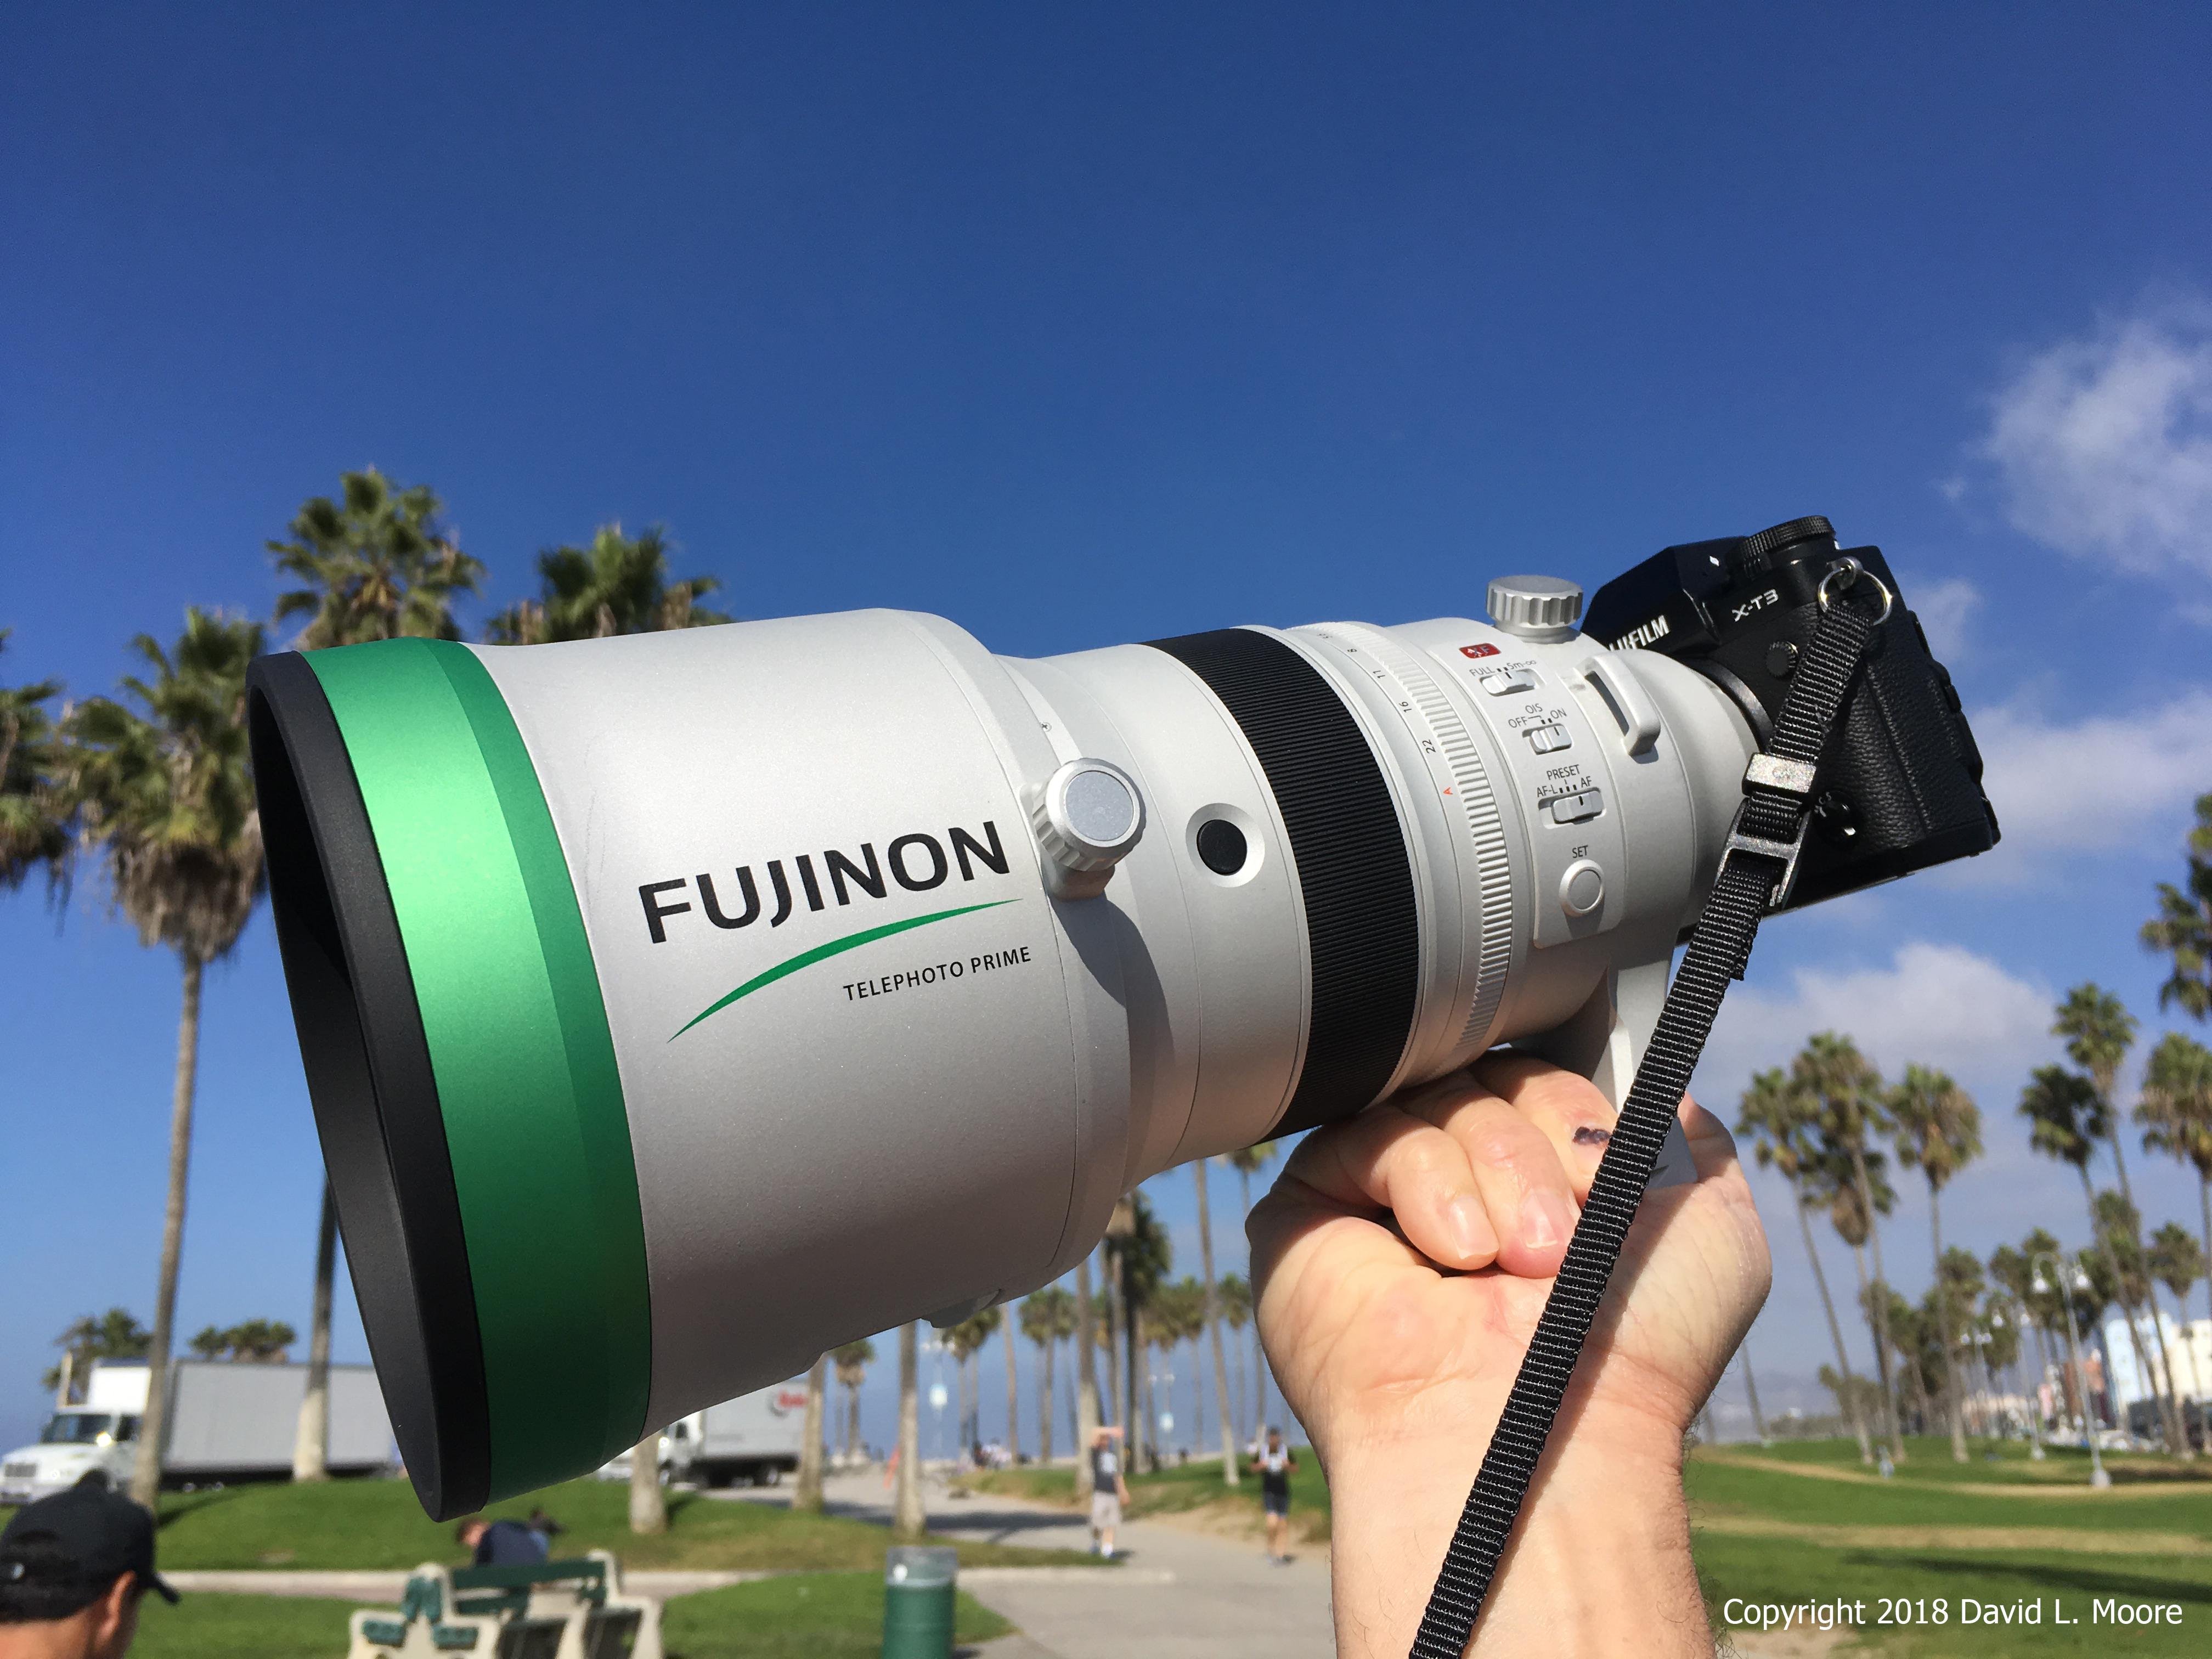 http://moore-photo.com/example/20181007_Fujifilm_Festival_Moore_01.JPG